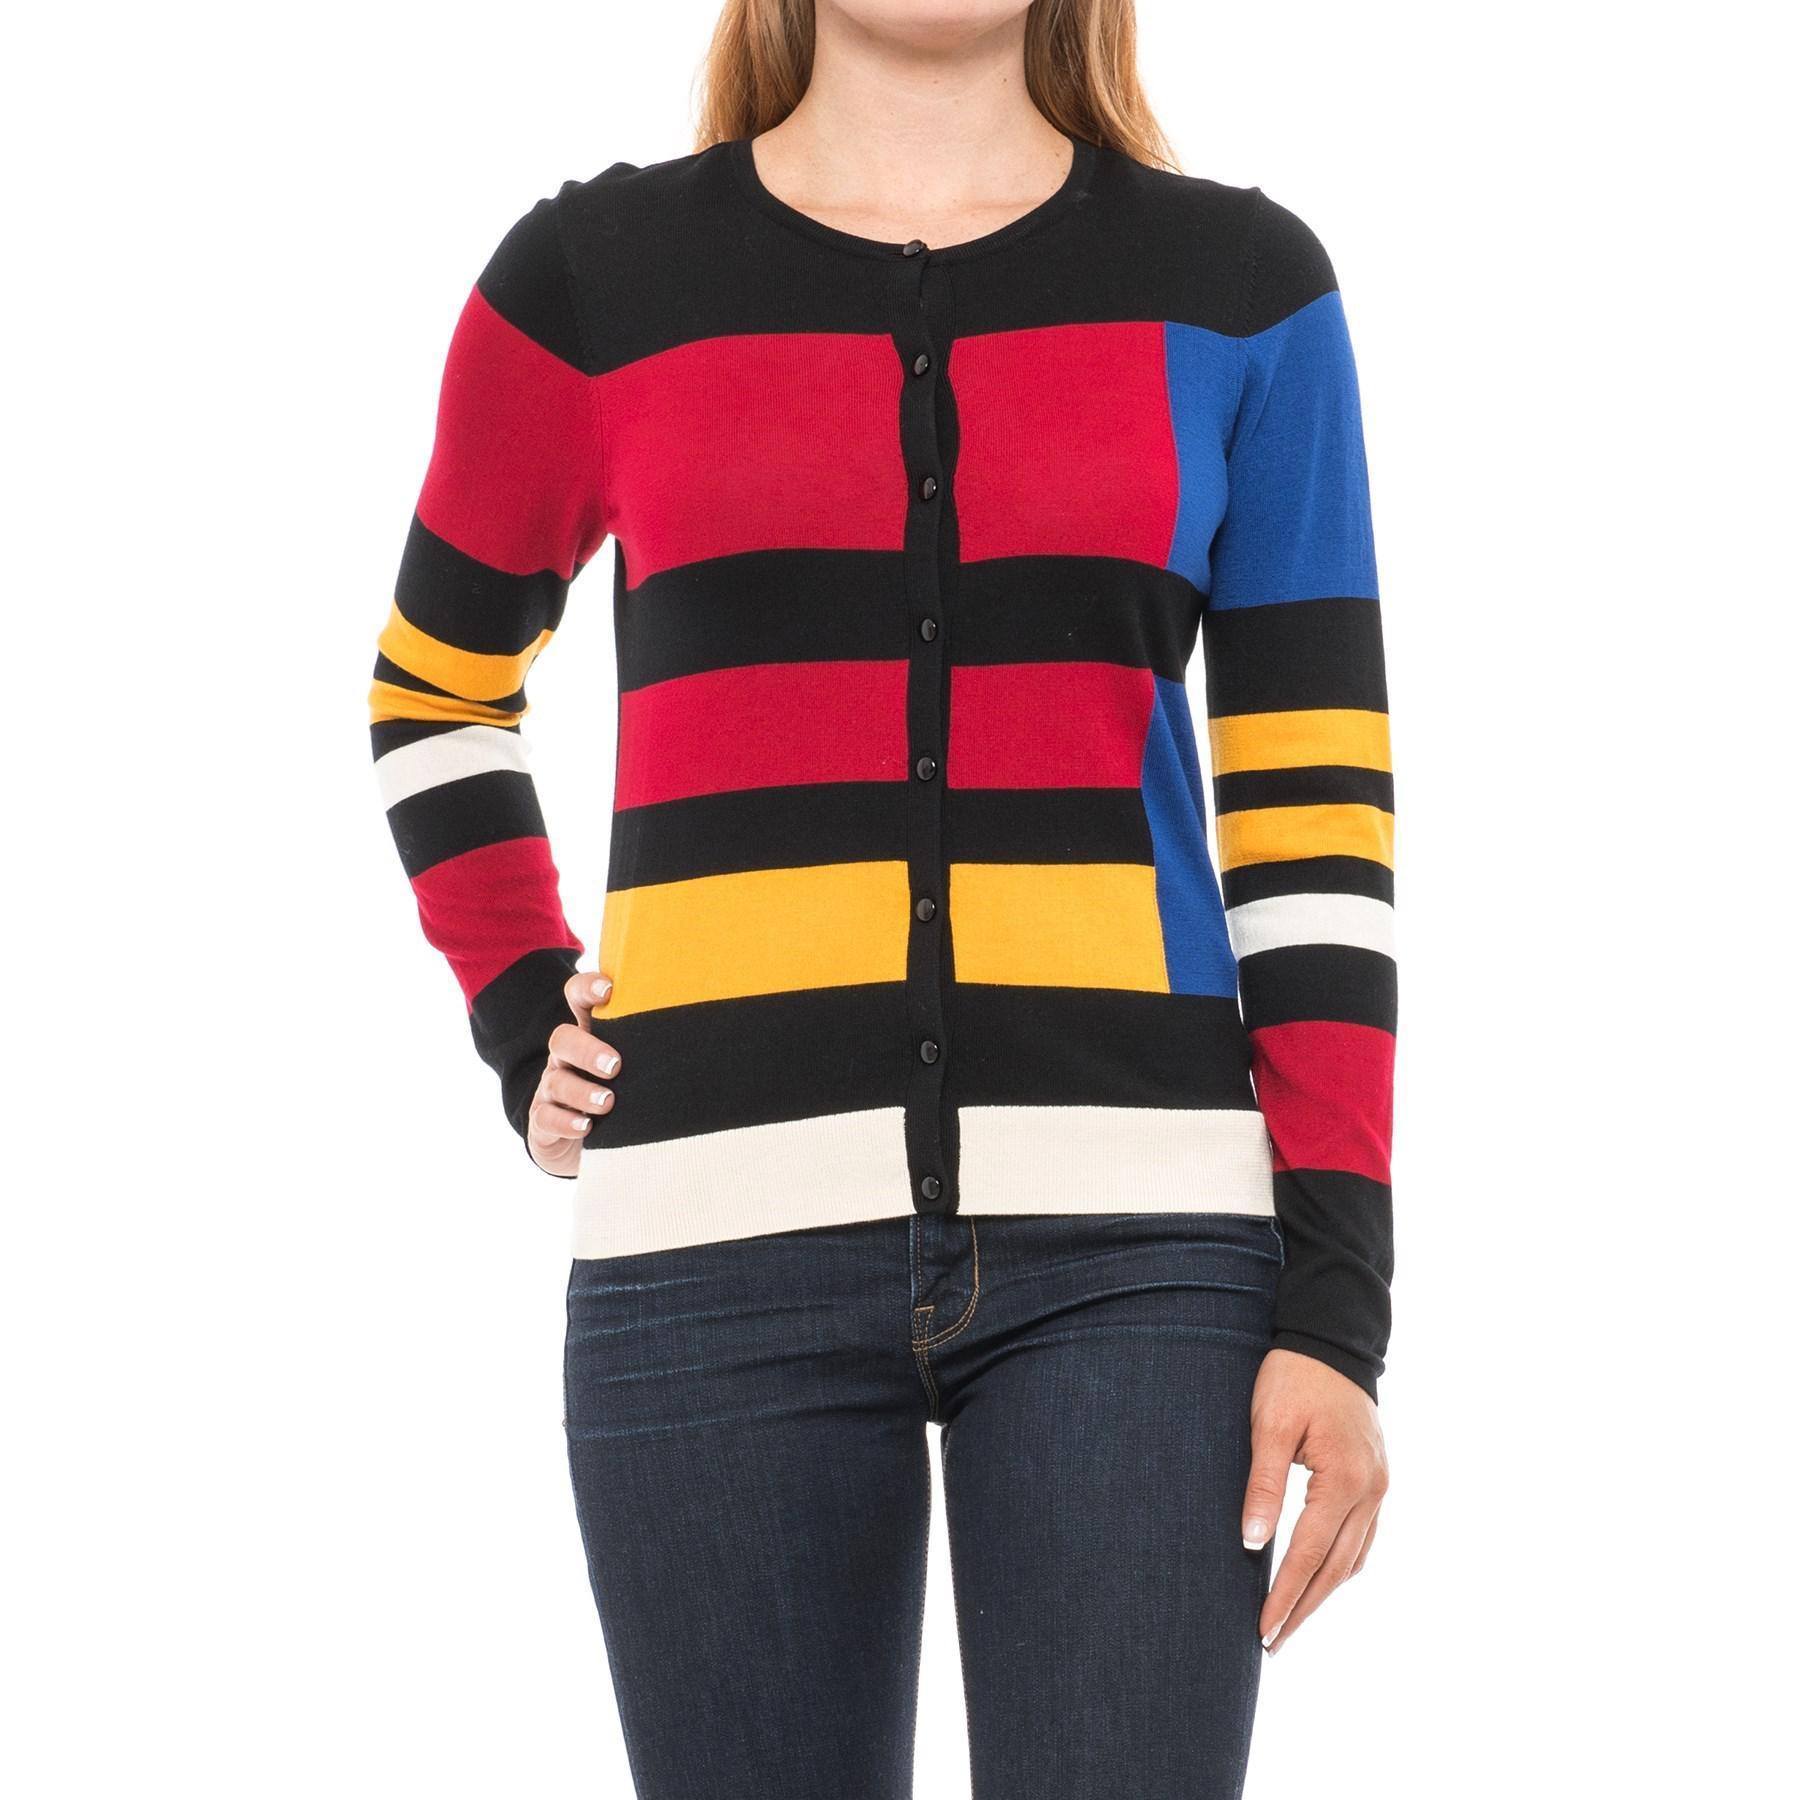 Lyst - August Silk Color-block Cardigan Sweater (for Women) a7ef7fda3